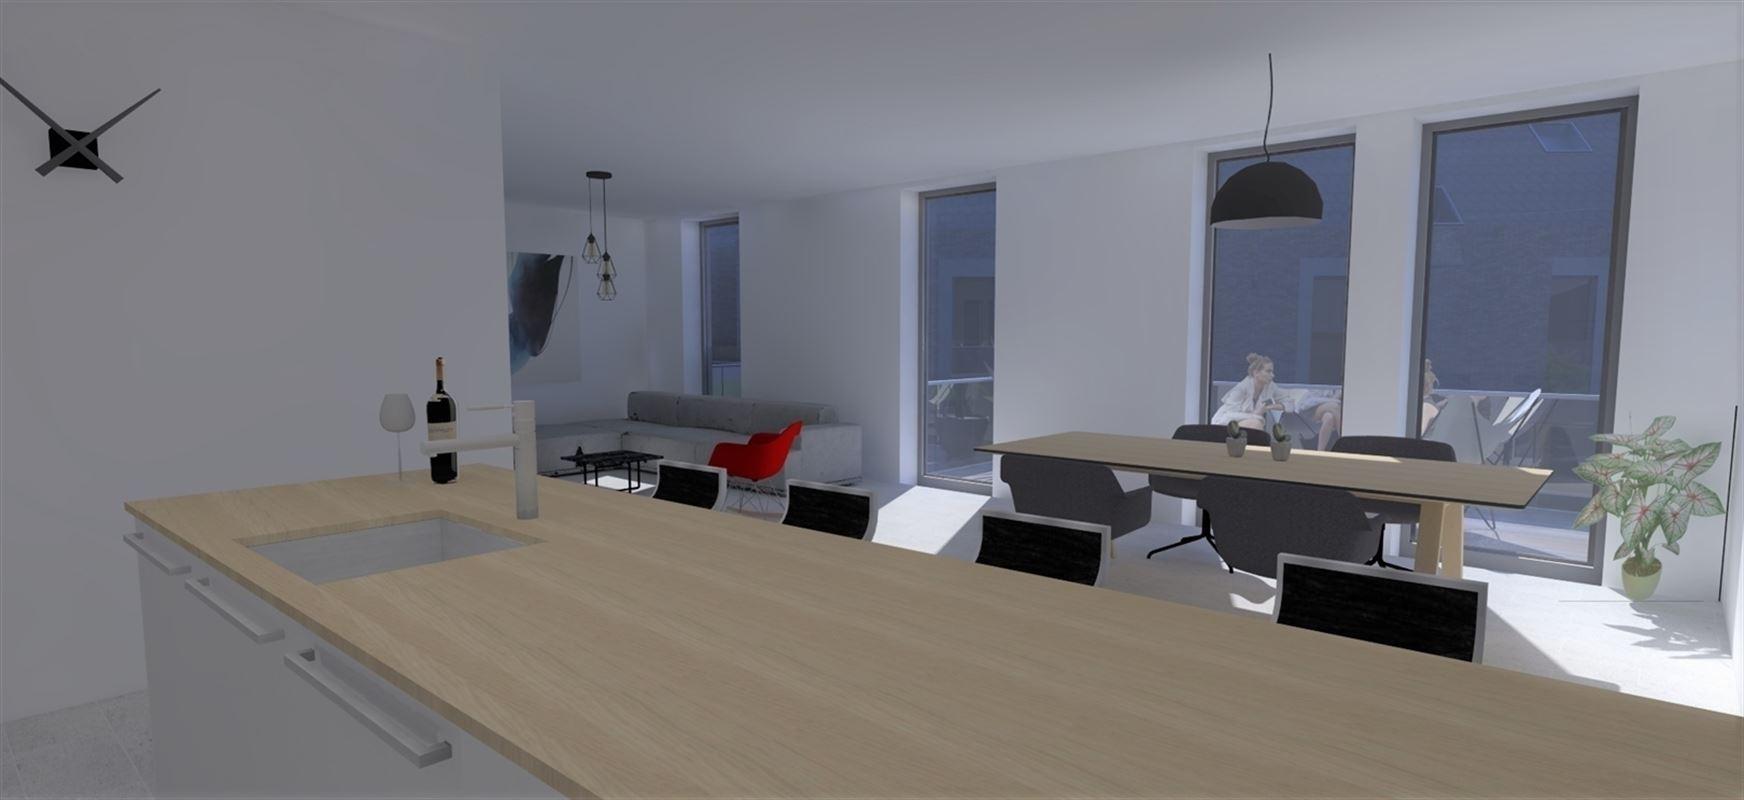 Foto 3 : Appartement te 3960 BREE (België) - Prijs € 226.800